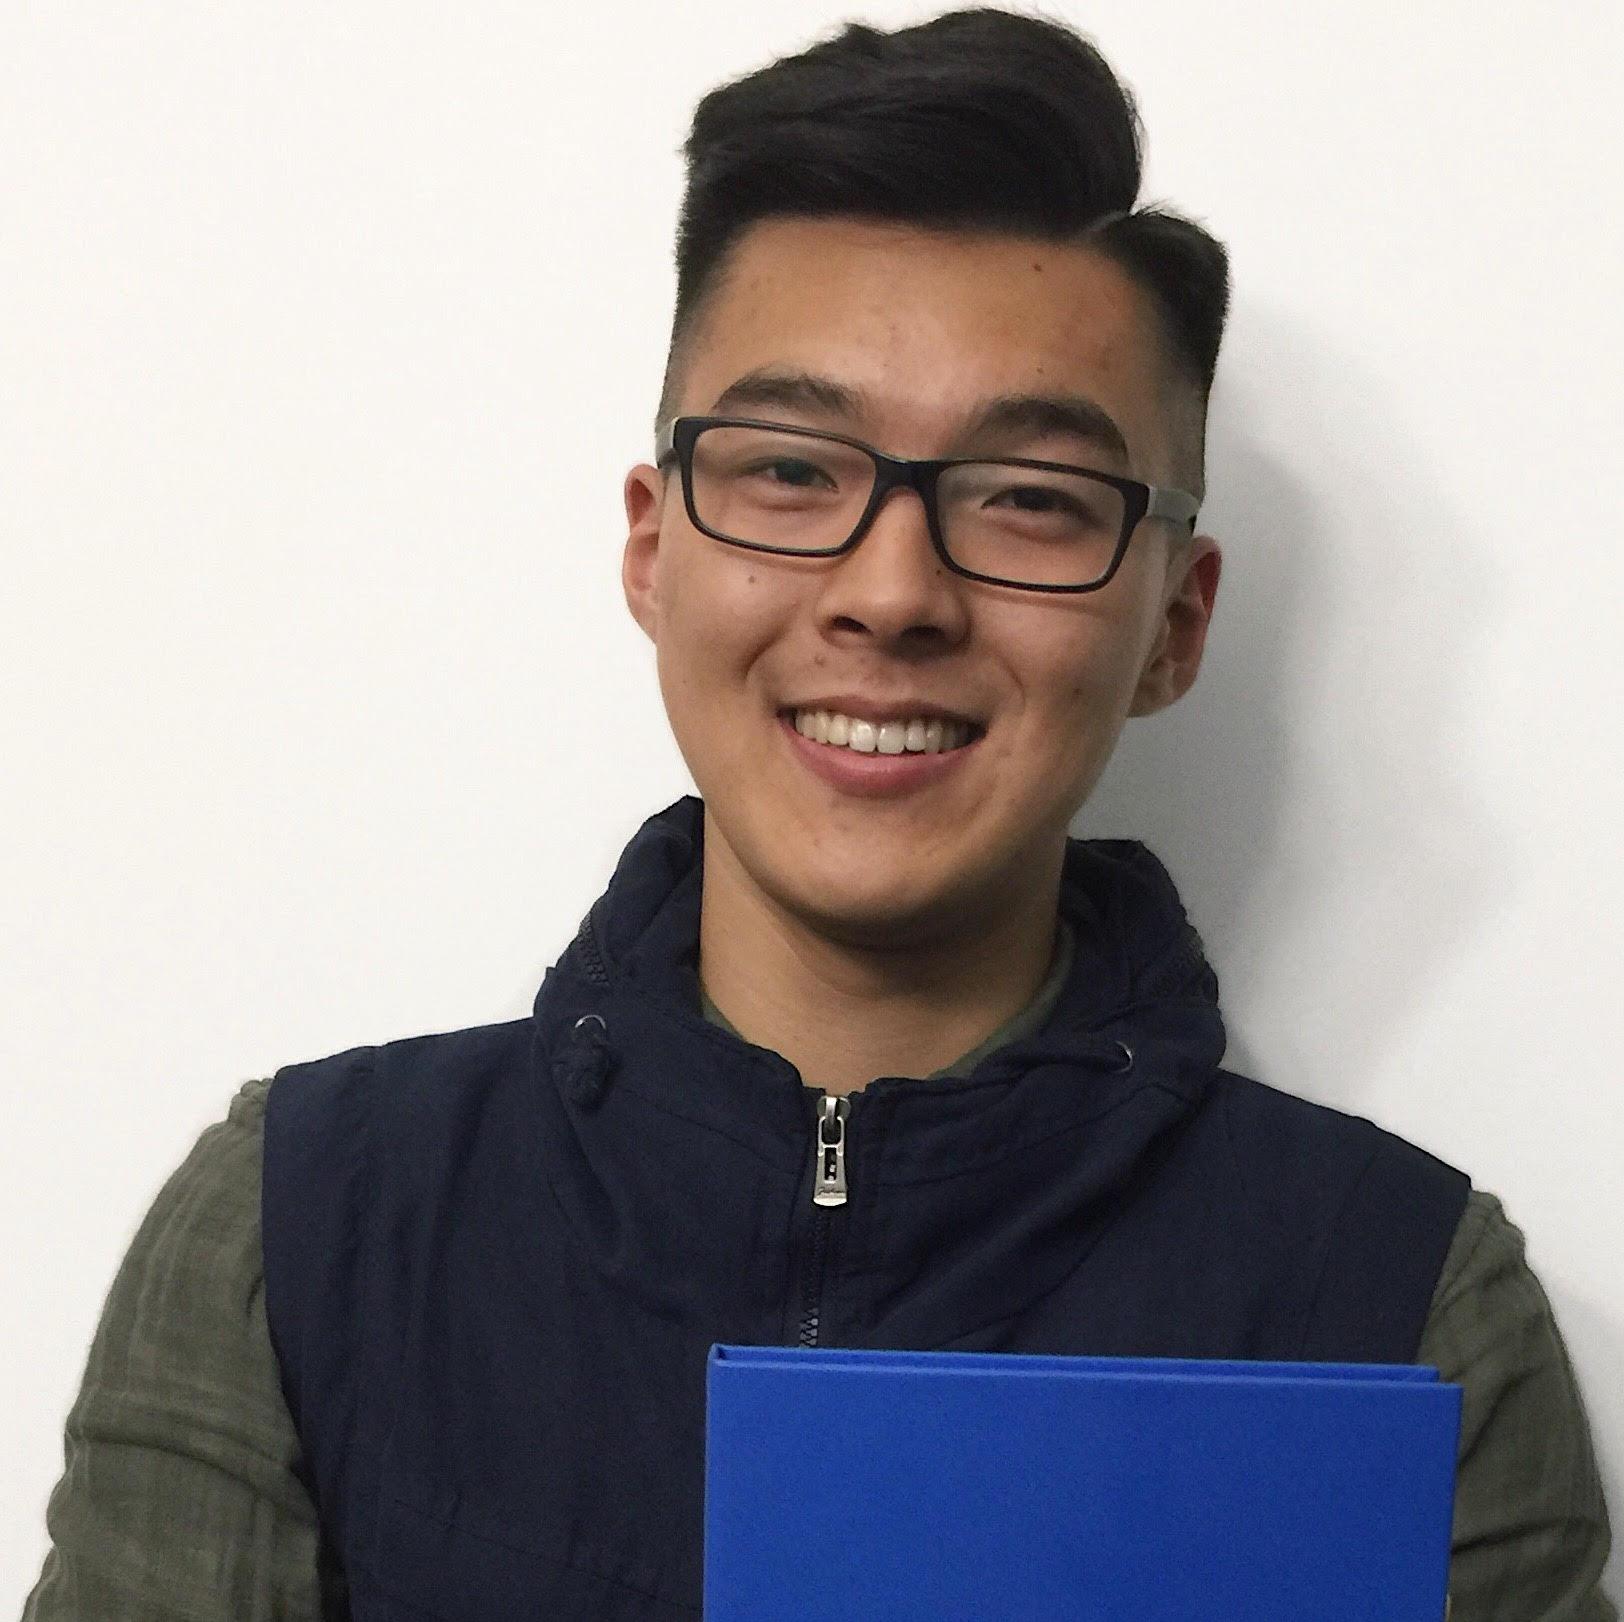 My name is  Joel Xu ! I'm the Founder of Model Millennials. Pleasure to e-meet ya :)